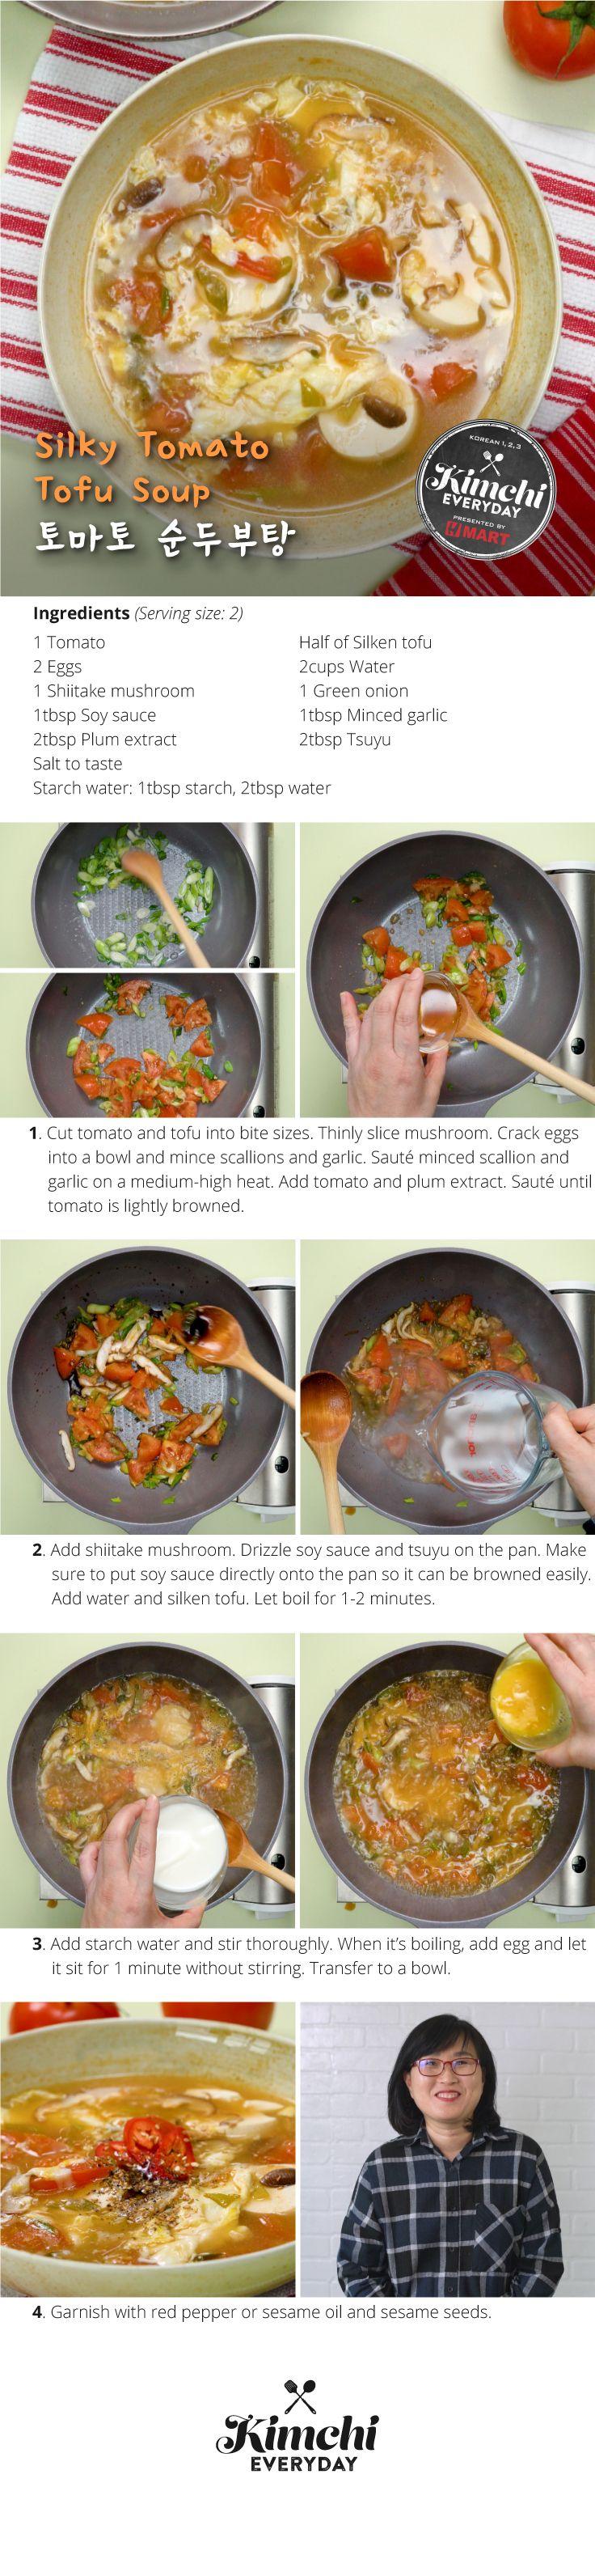 kvd_htc_silky tomato tofu soup